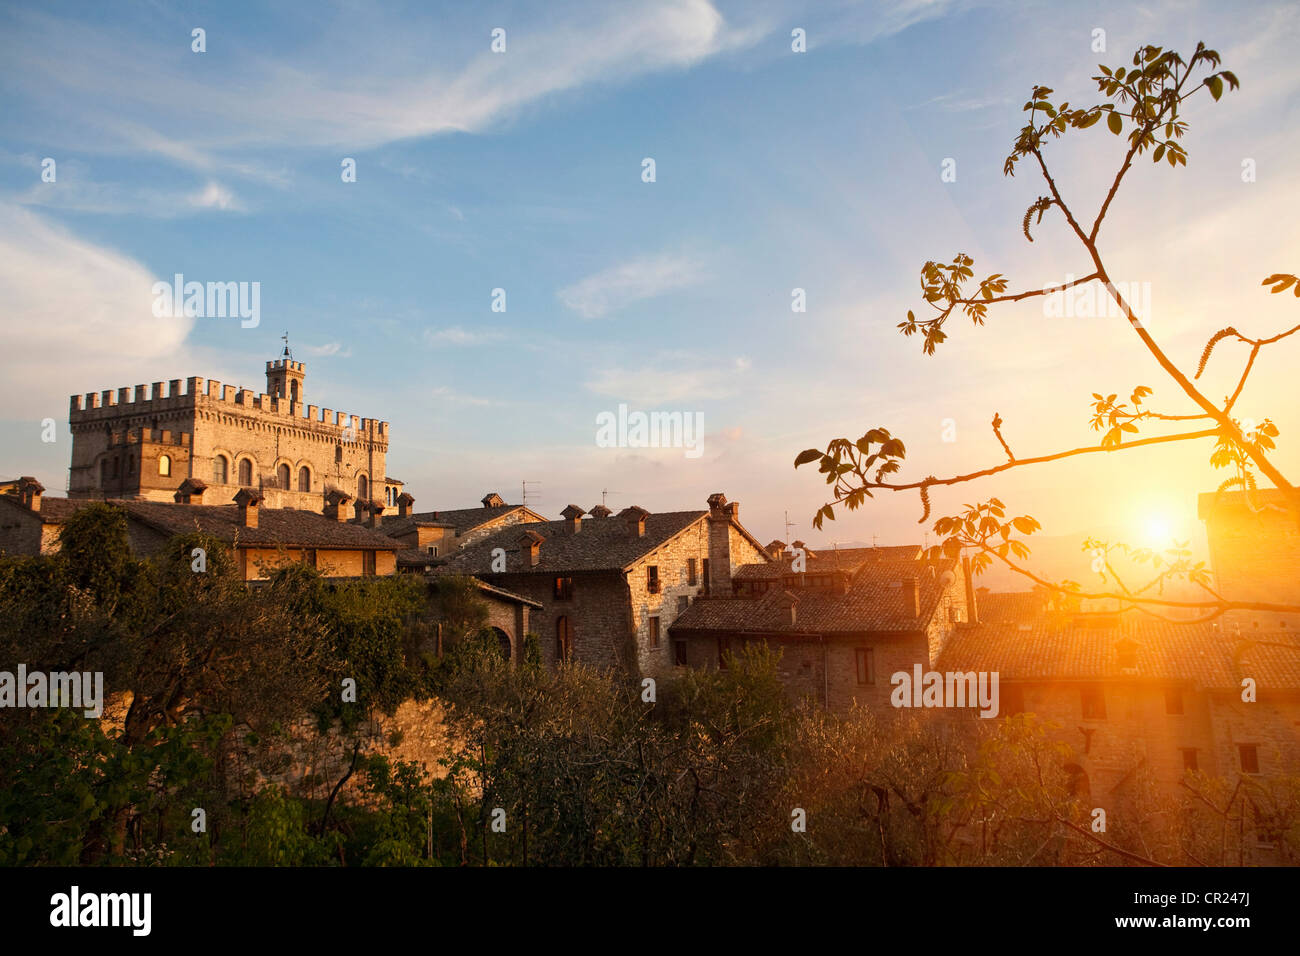 Sonne auf Dorfhäuser Stockbild